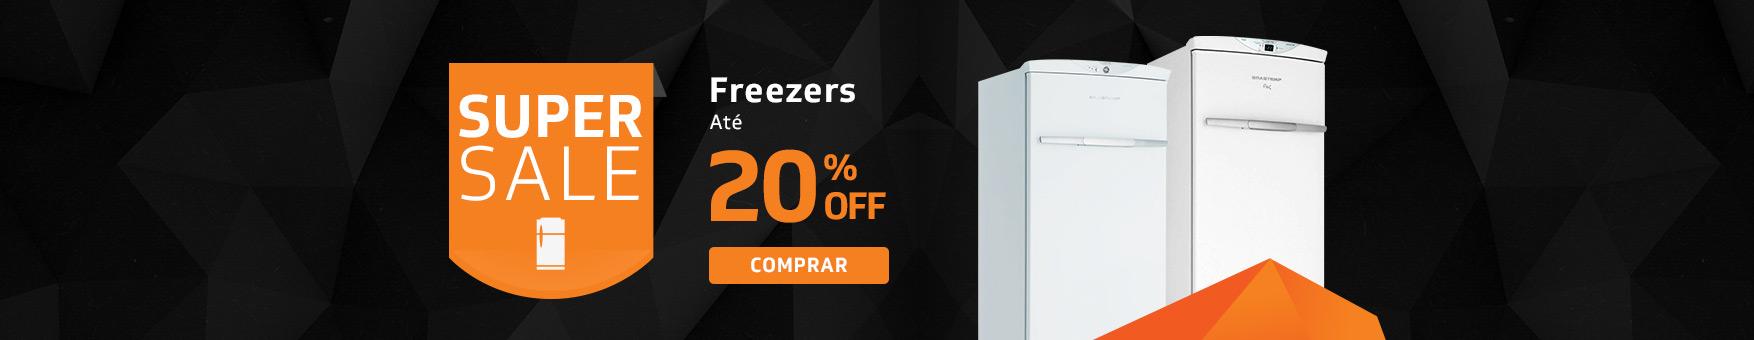 Promoção Interna - 97 - super sale_freezers_home_29062015 - freezers - 2